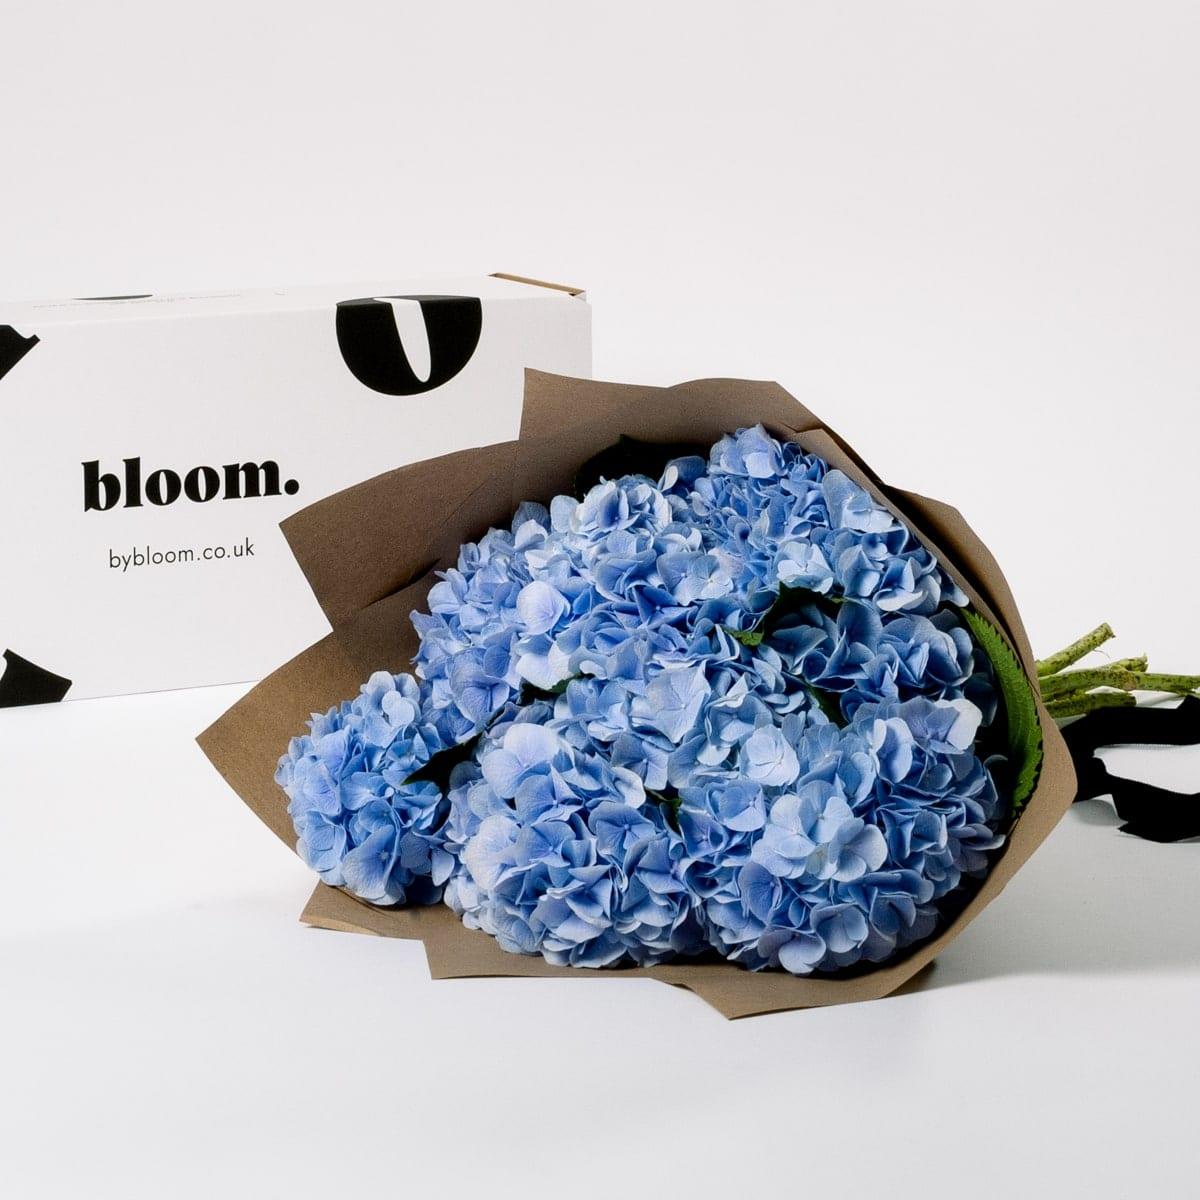 Bloom Flower Delivery   Powder Blue Hydrangea